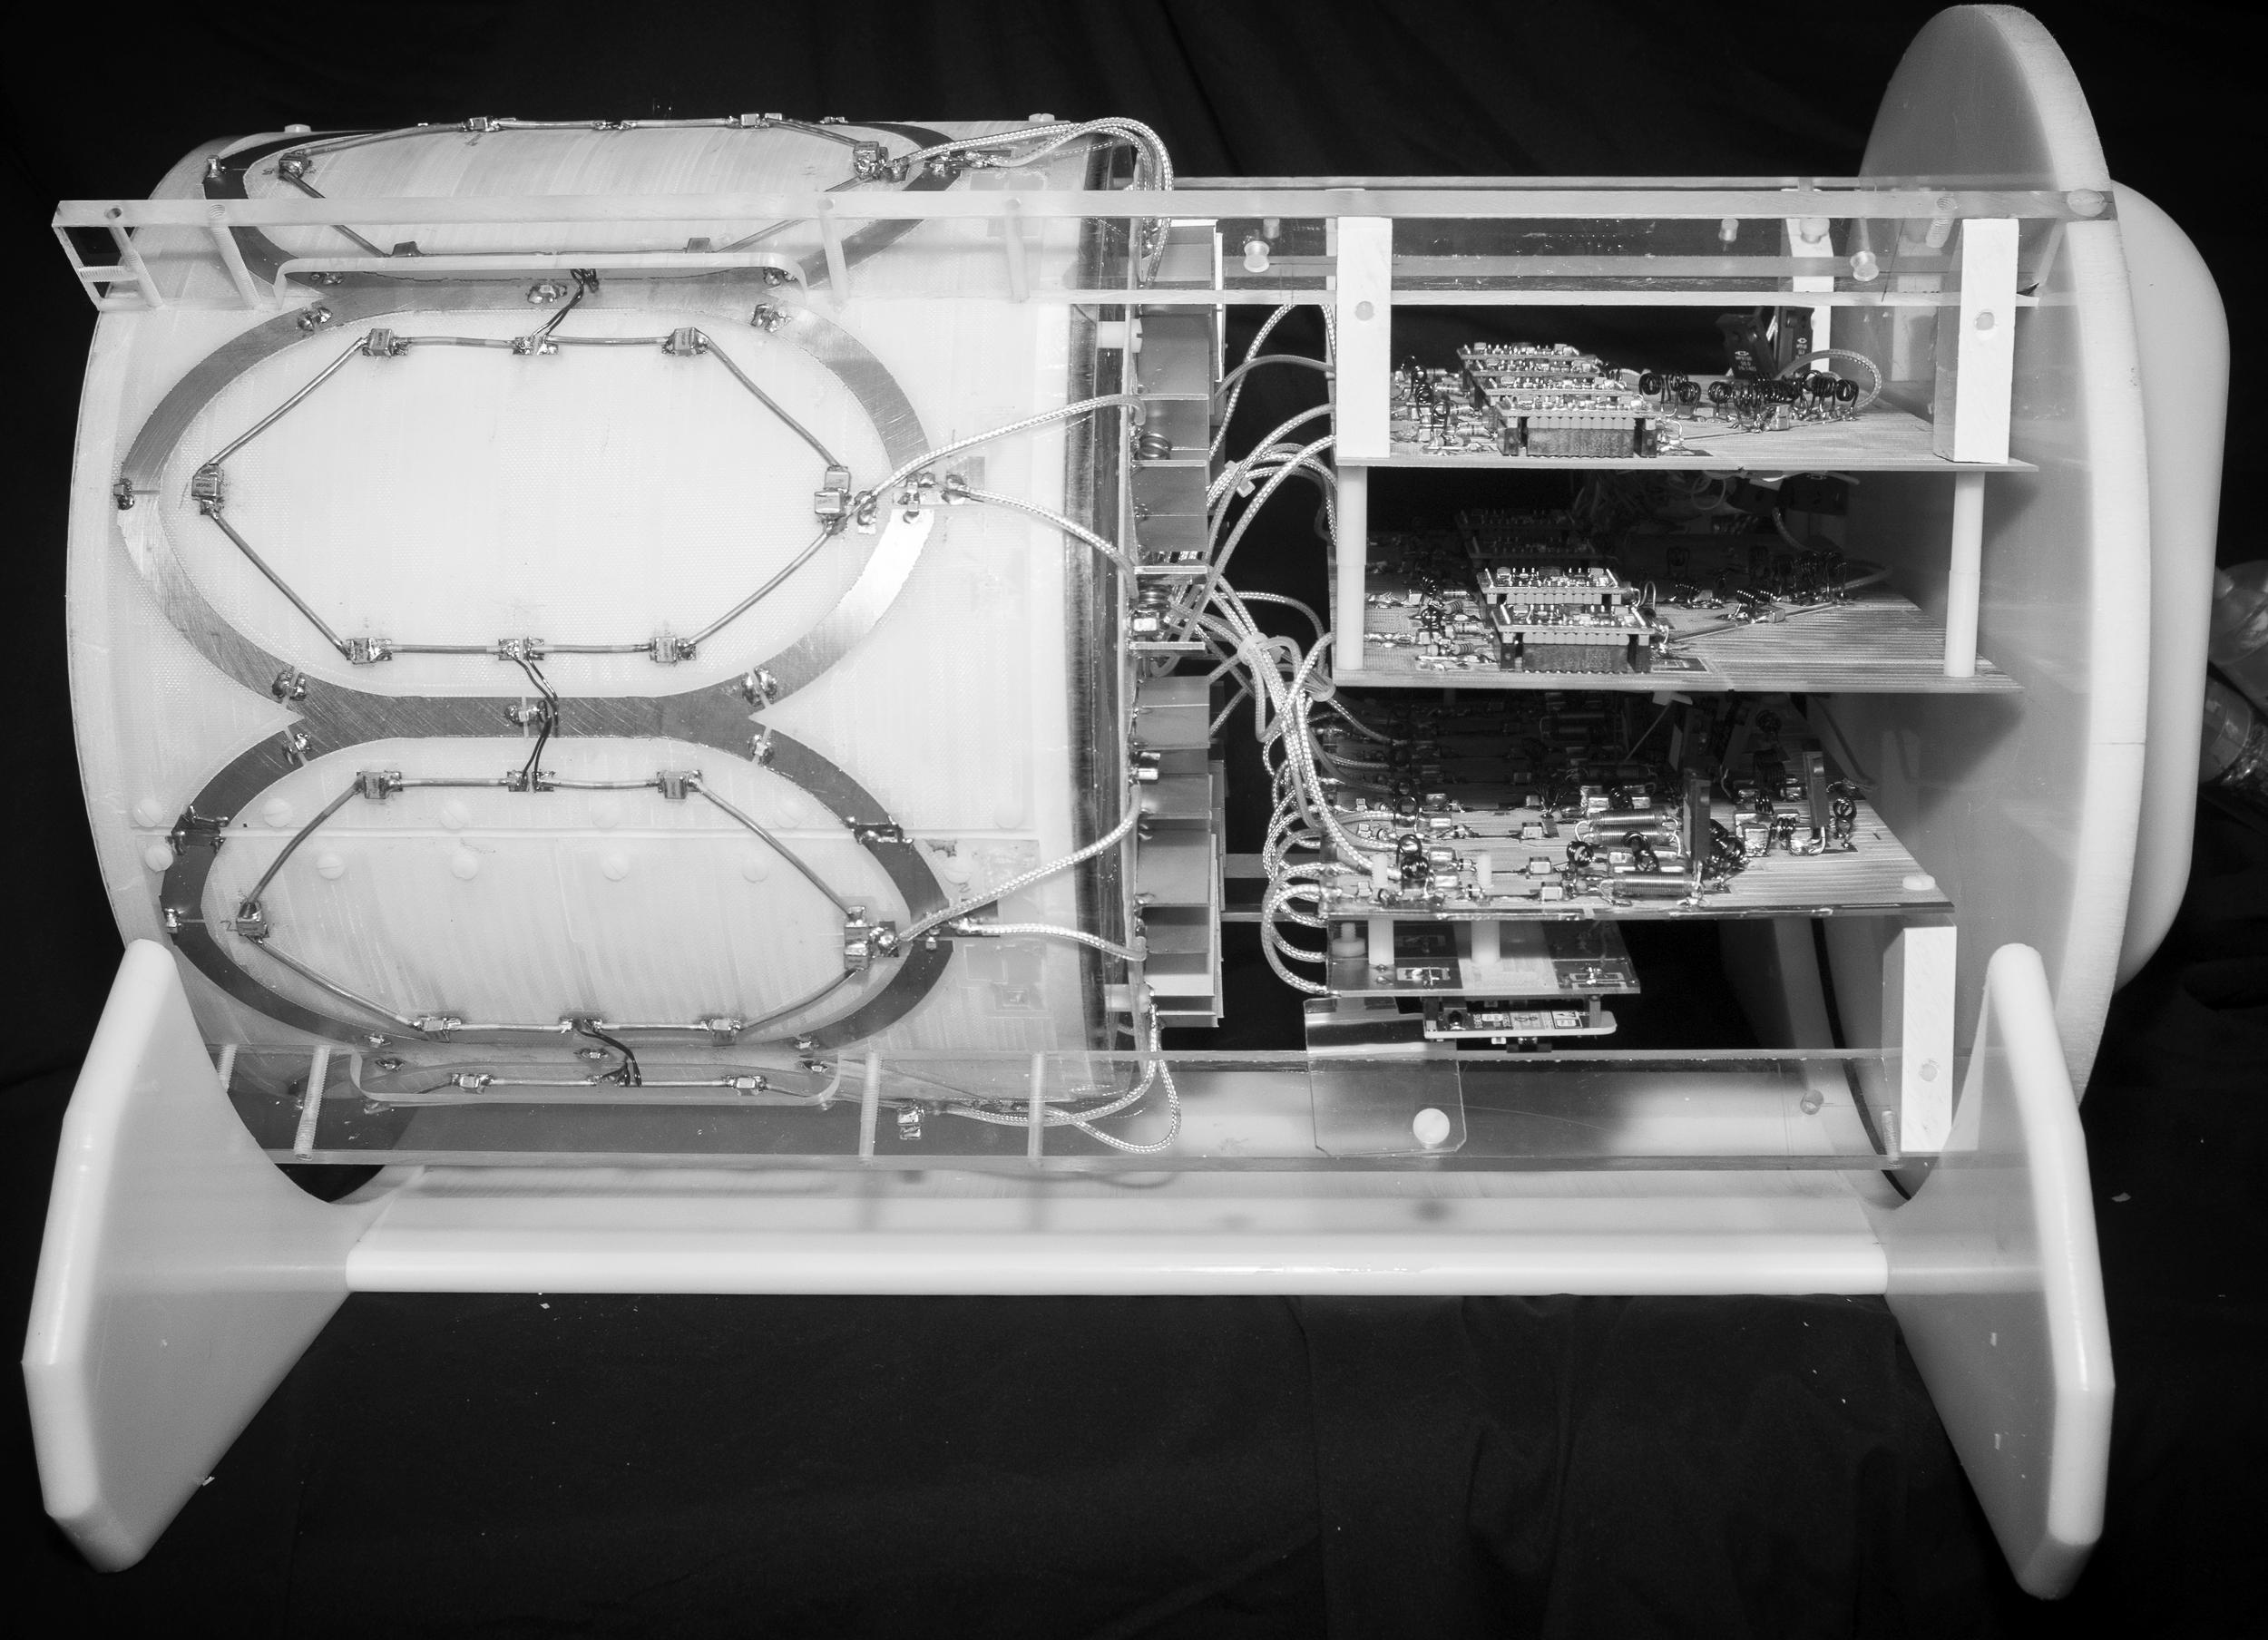 Phosphorus / Proton Array for 7 Tesla Brain MRI